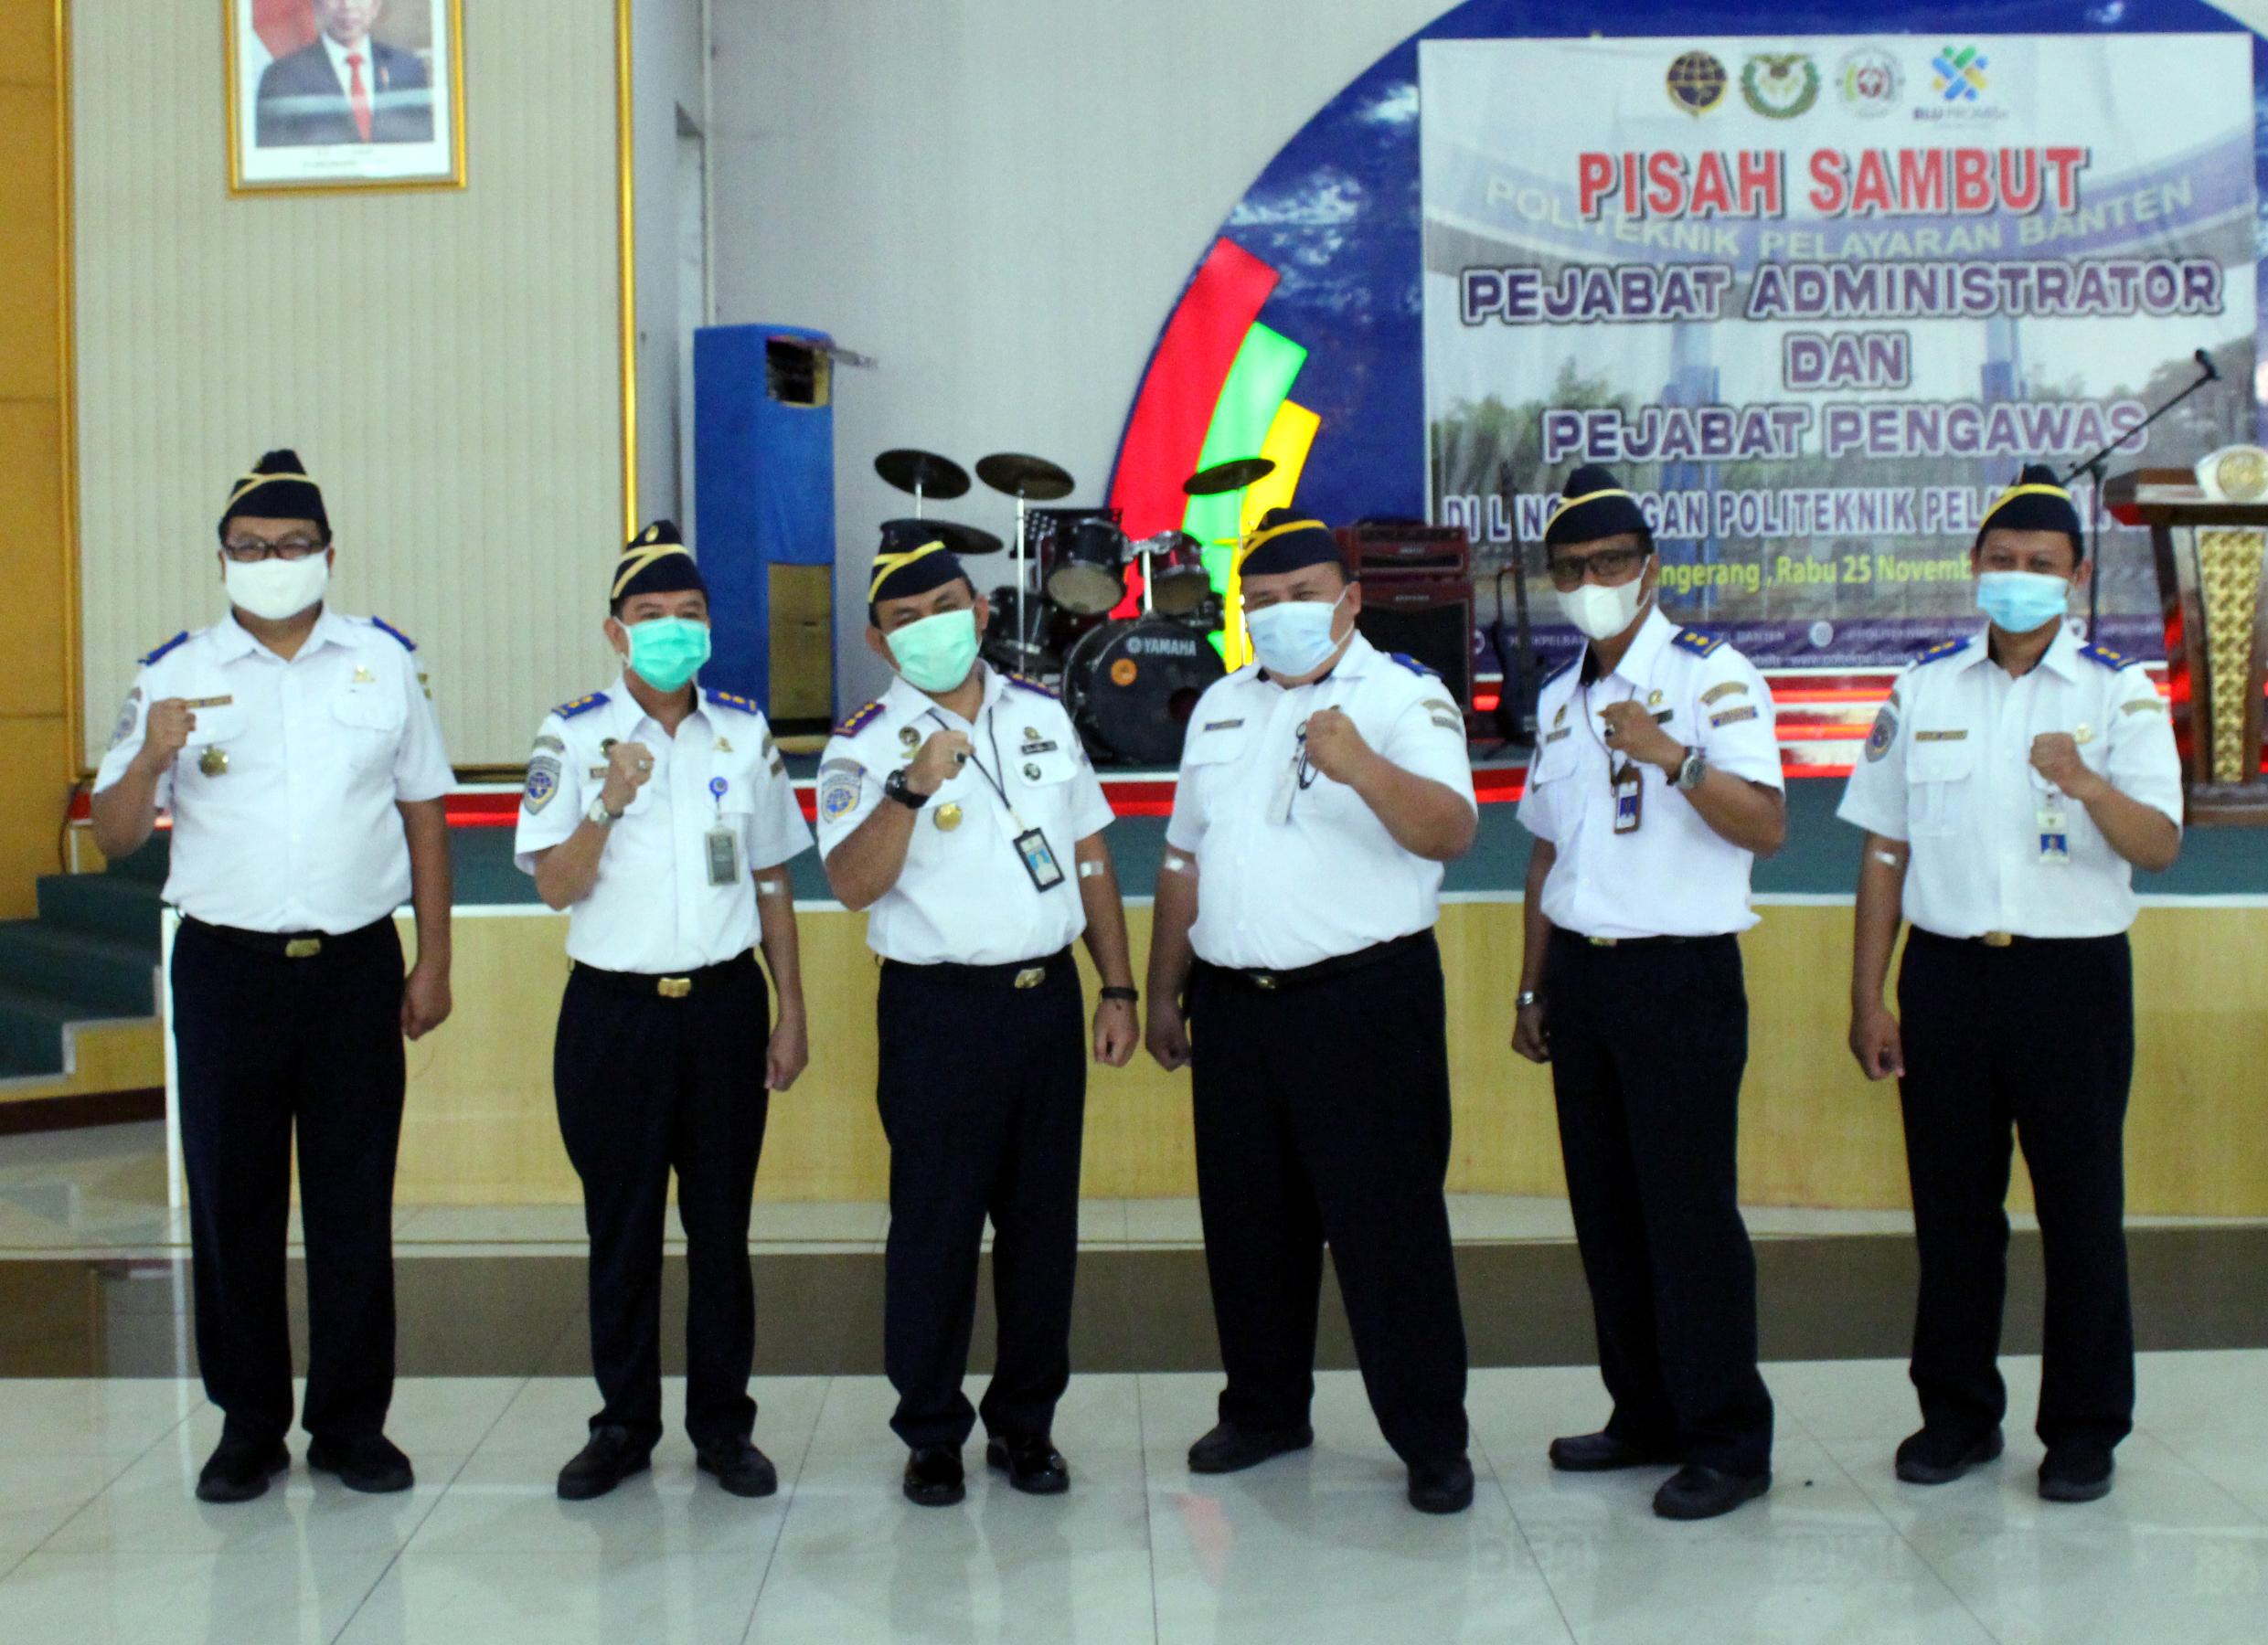 Pisah sambut Pejabat Administrator dan Pejabat Pengawas di lingkungan Politeknik Pelayaran Banten